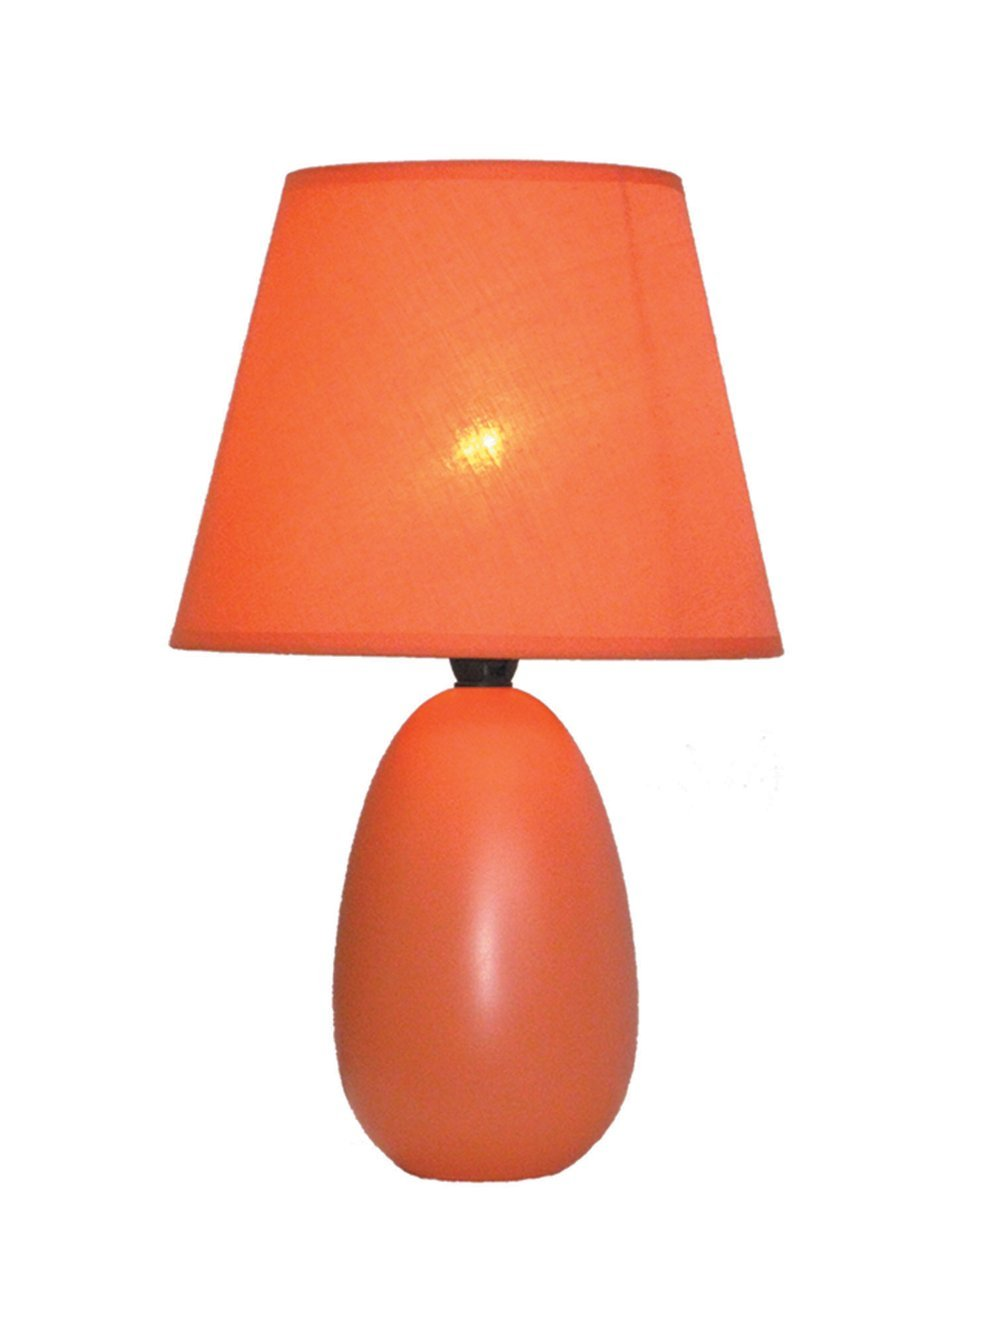 5.51 x 5.51 x 9.45 Simple Designs Home LT2009-BLU Mini Oval Egg Ceramic Table Lamp Blue